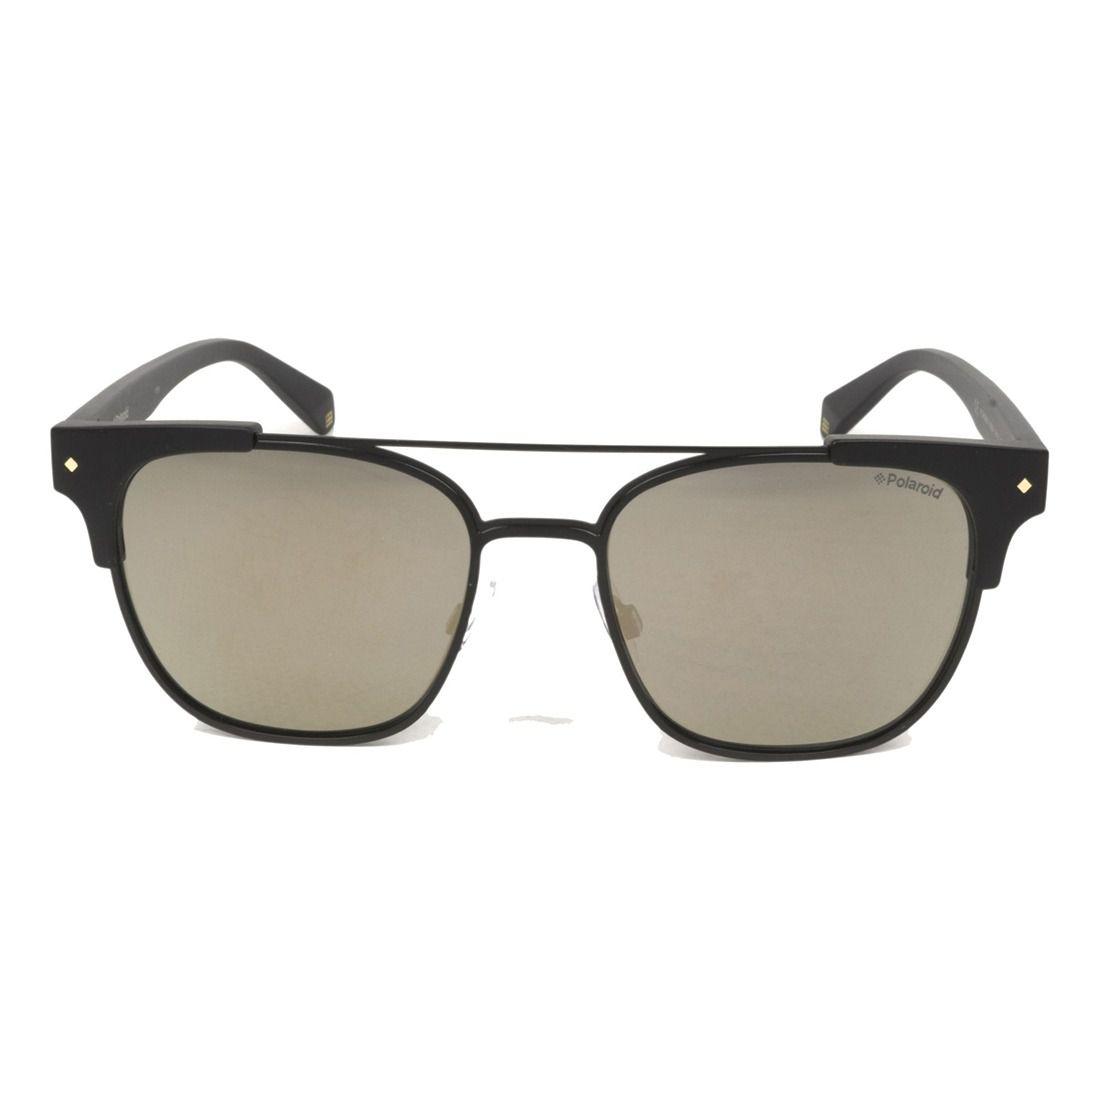 Óculos de Sol Polaroid Unissex PLD 6039 S X 003LM - Omega Ótica e ... b9e4d21135